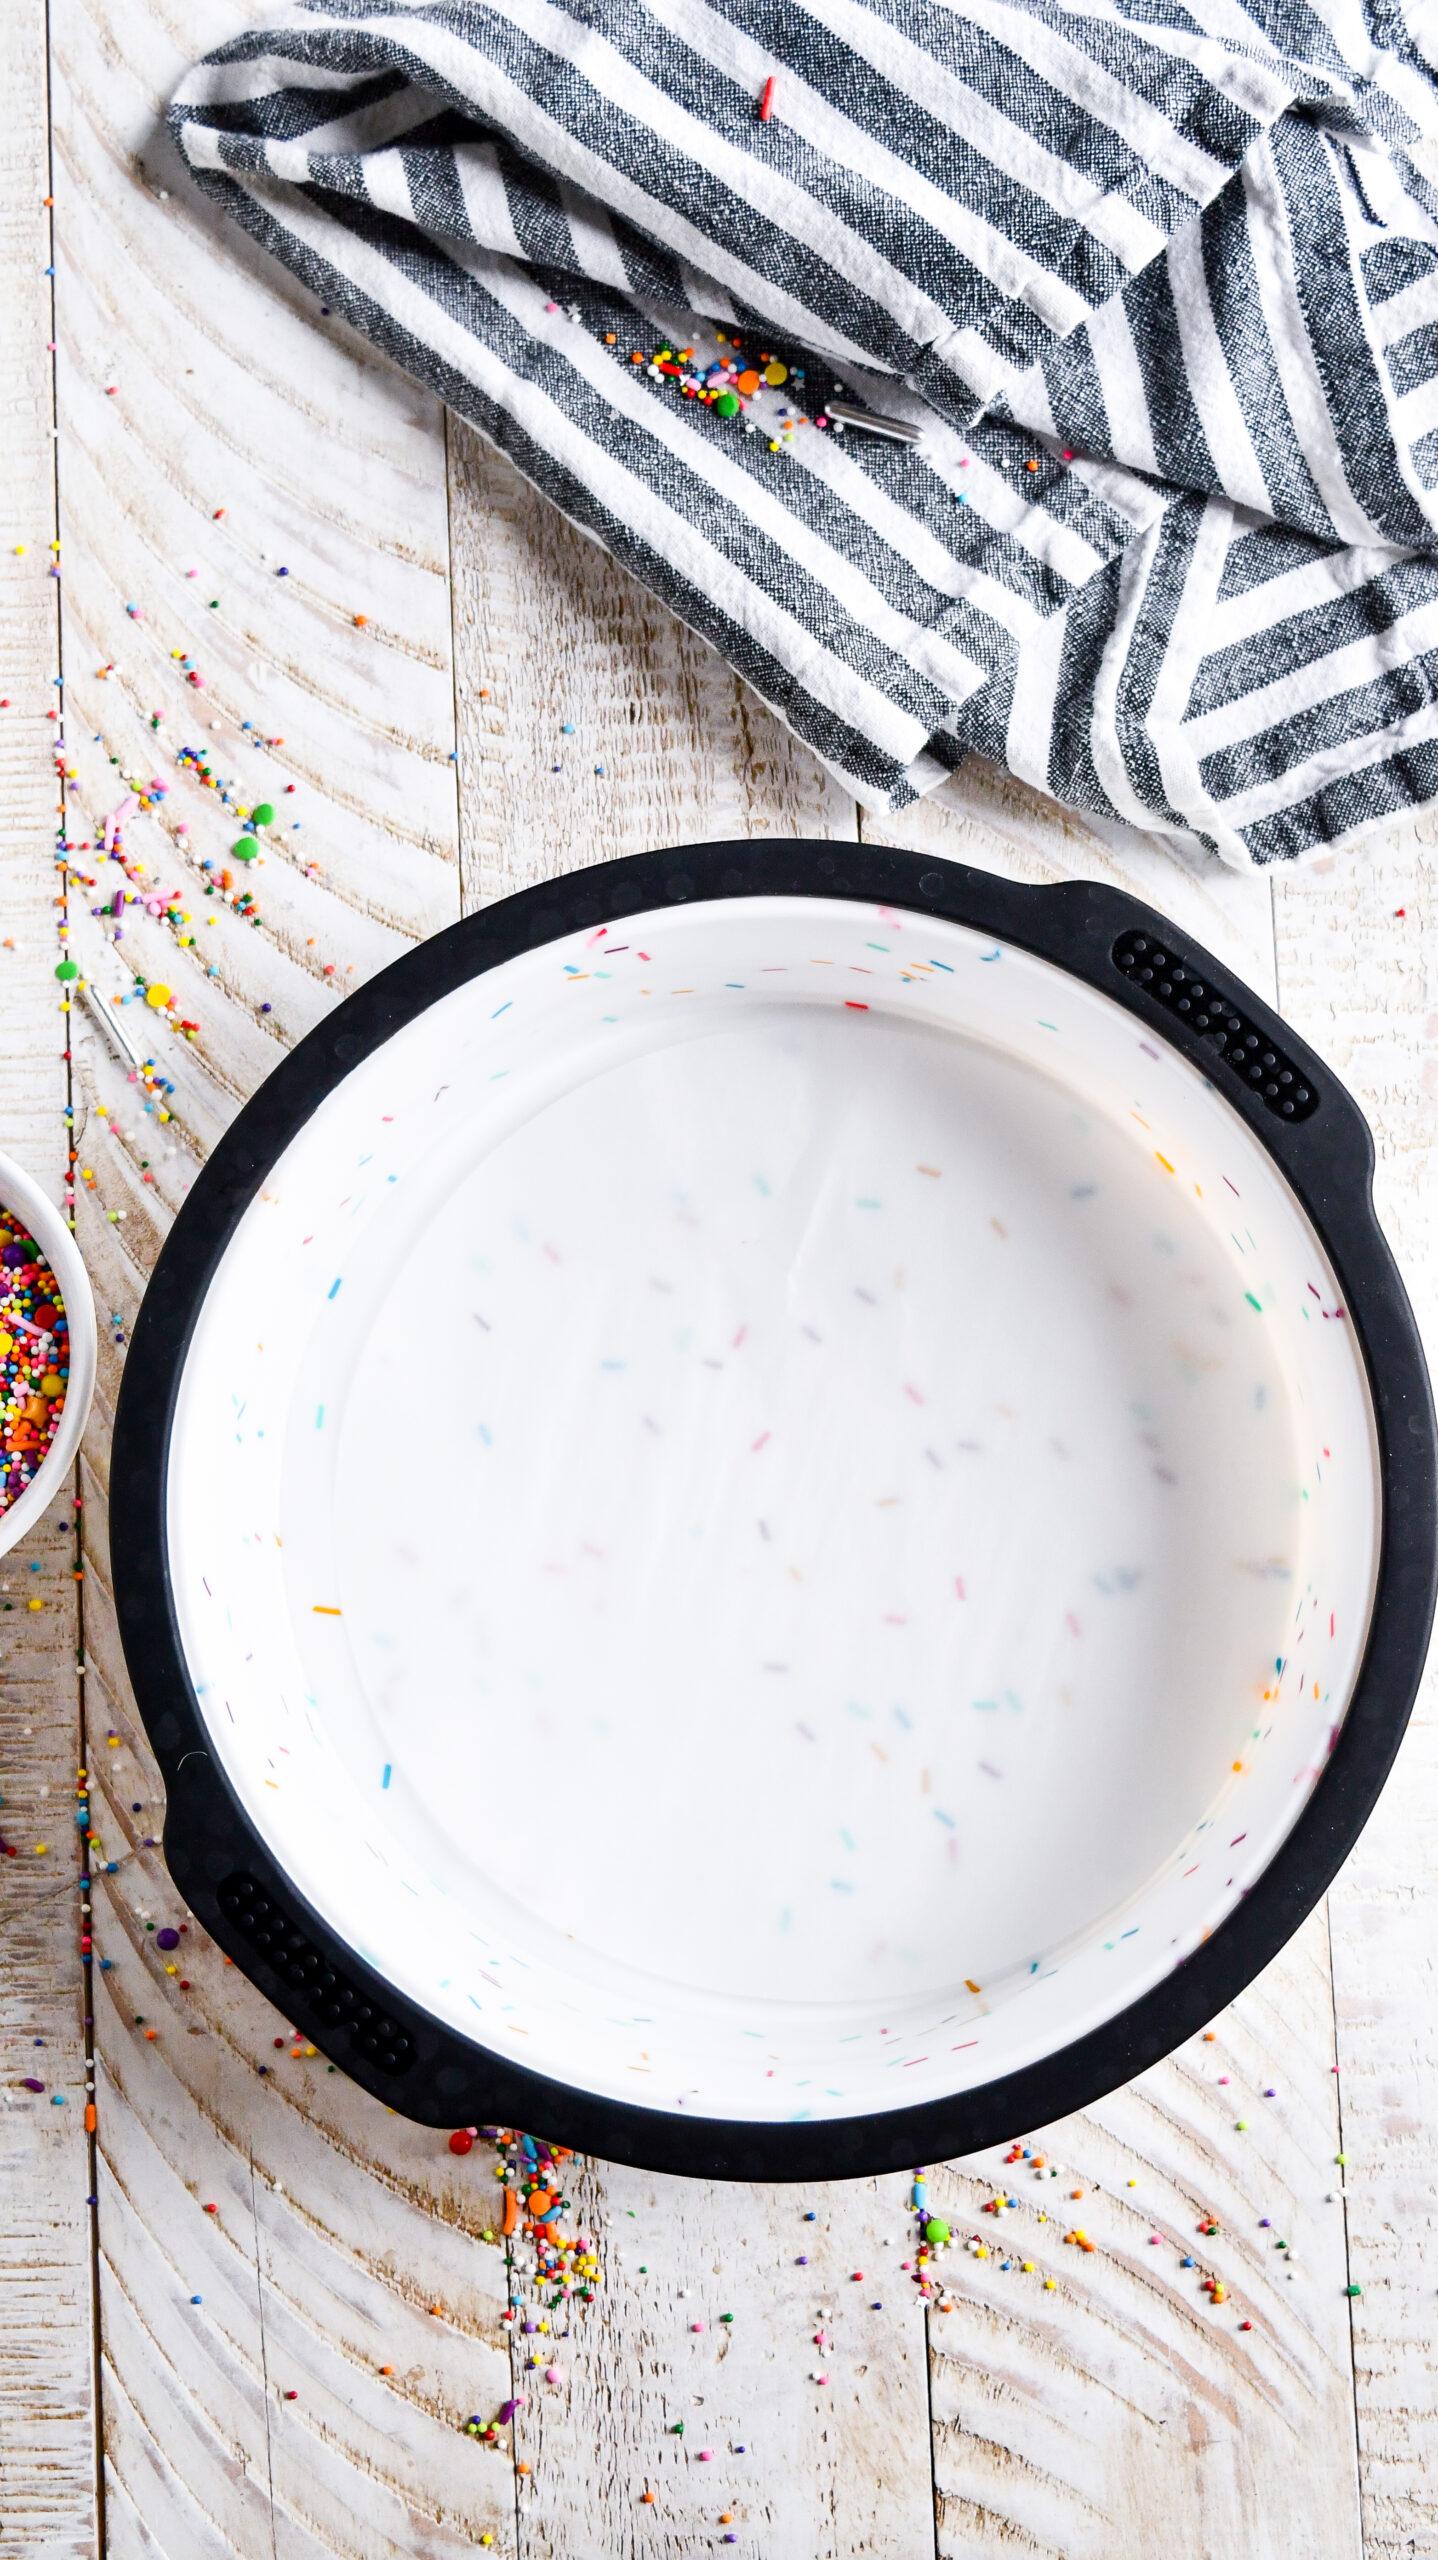 5-minute Microwave Cake Recipe